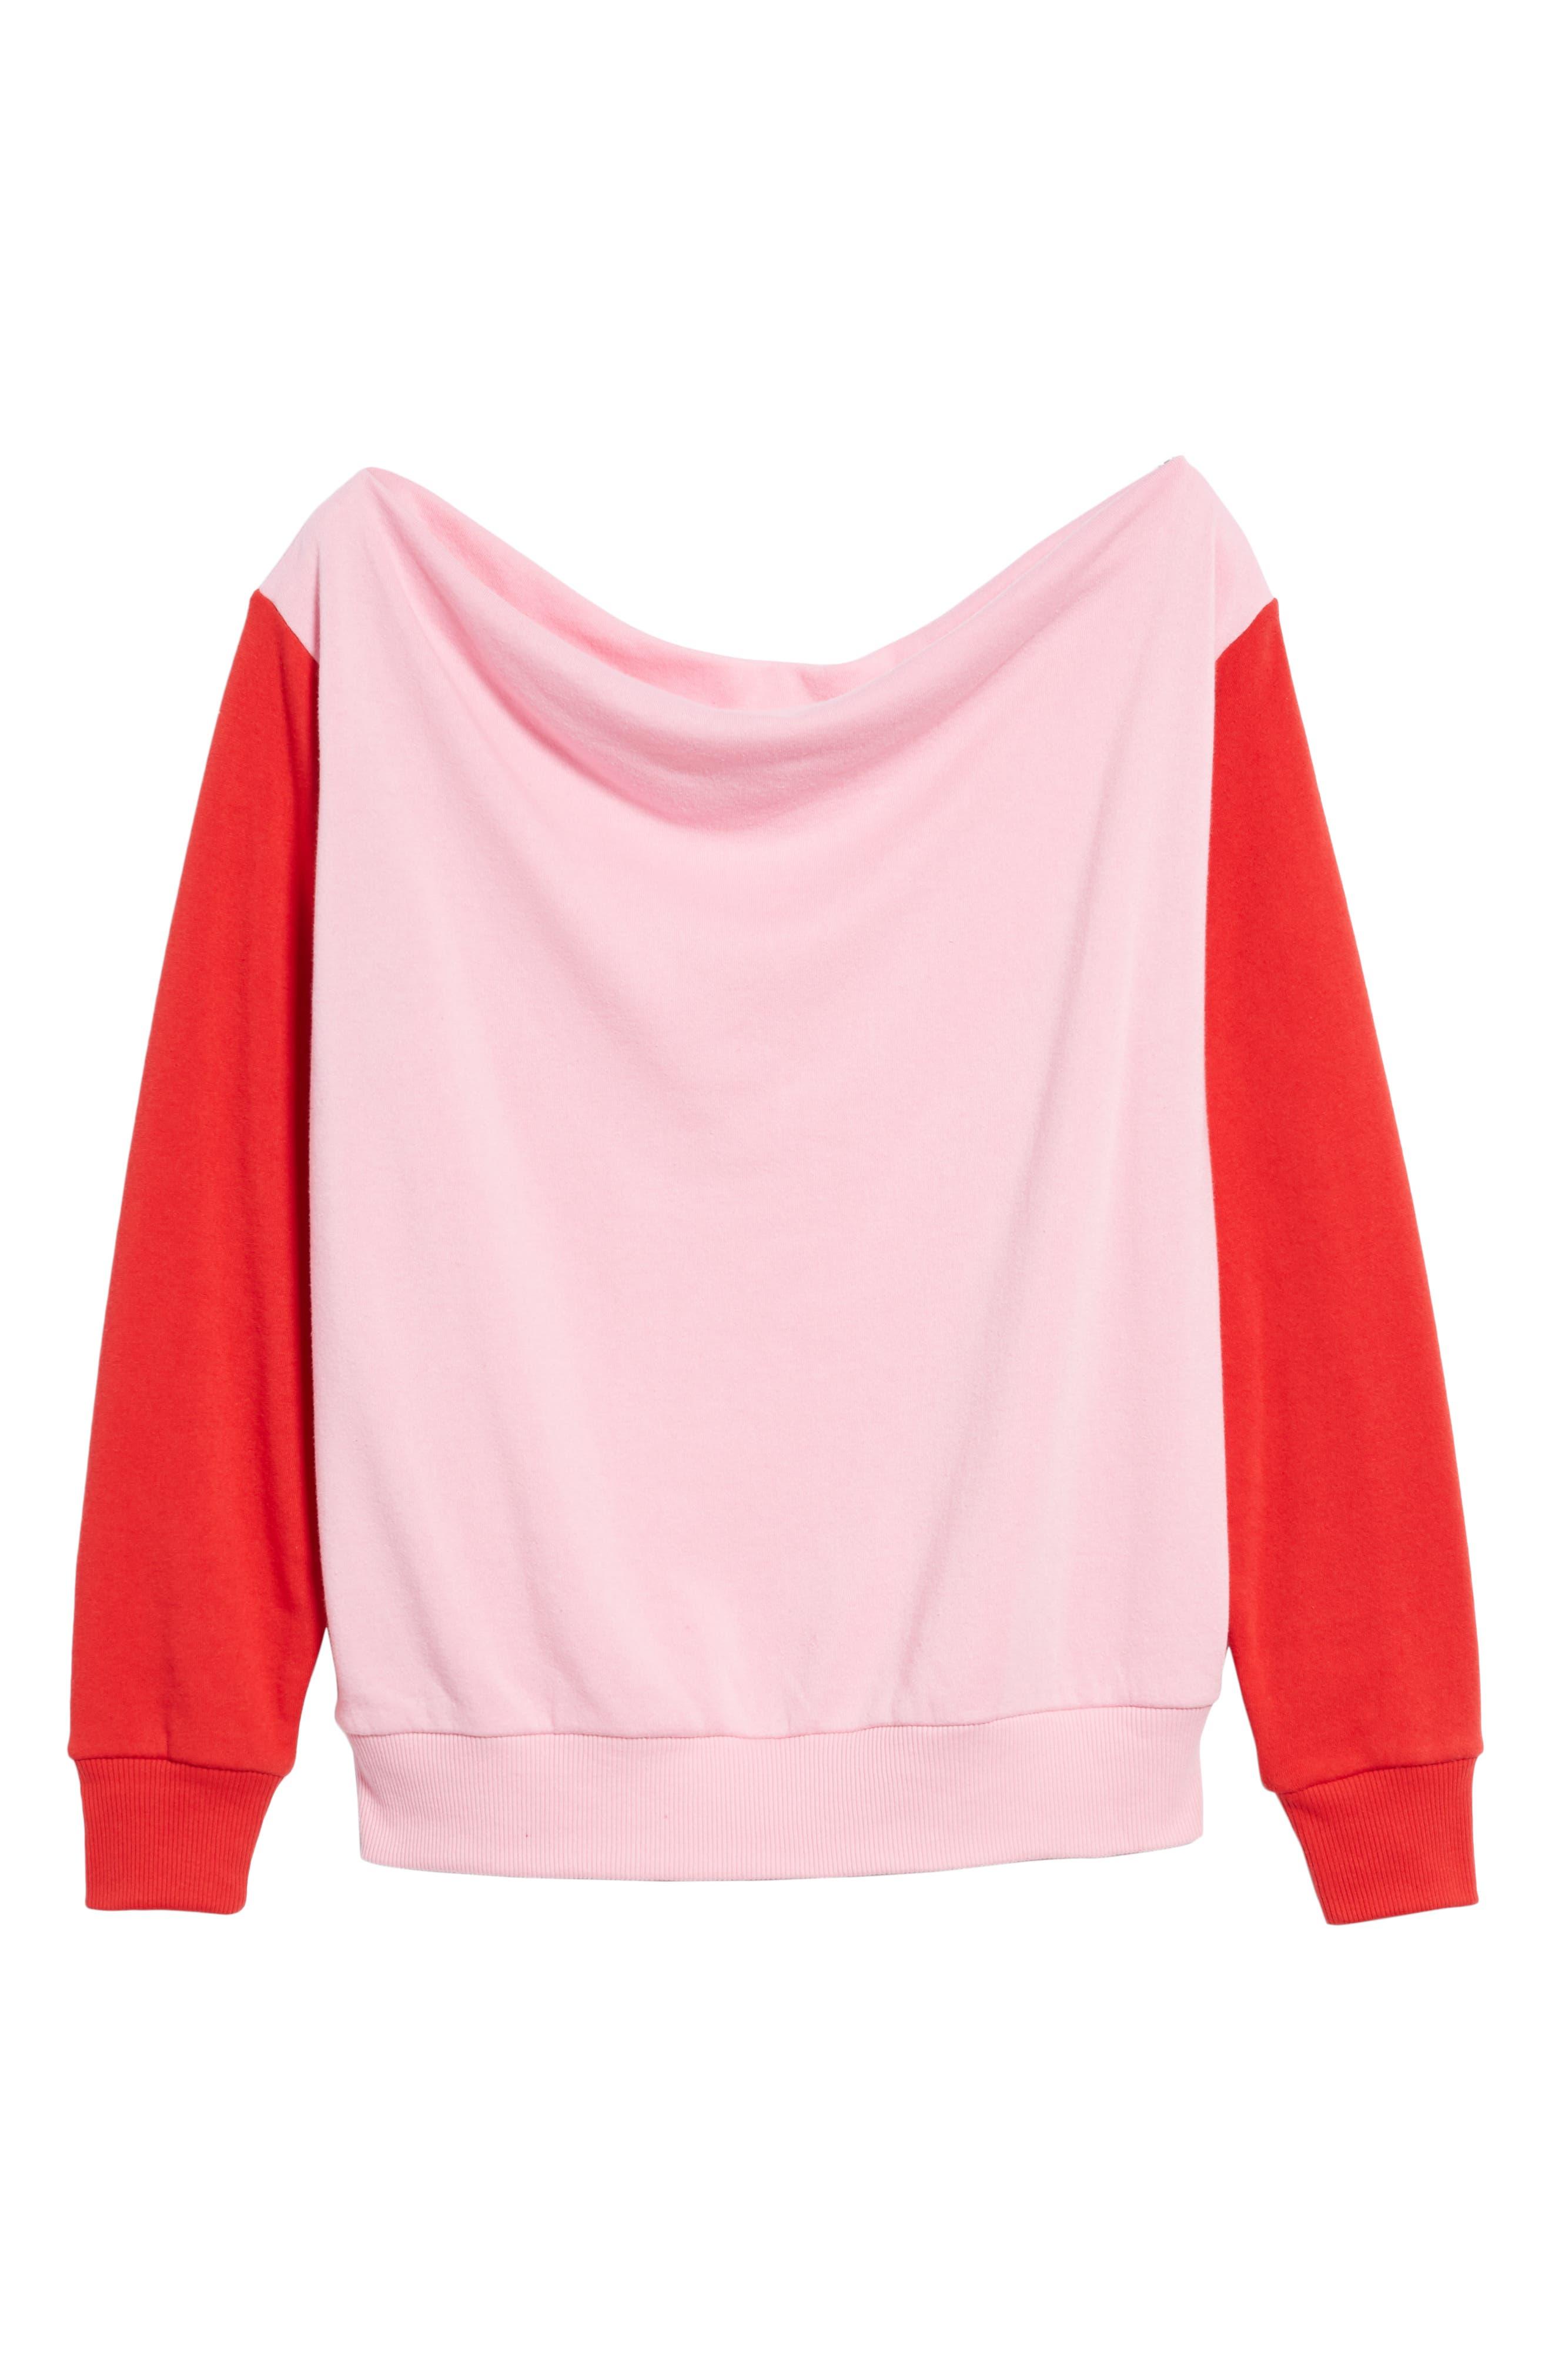 Colorblock Fleece Sweatshirt,                             Alternate thumbnail 6, color,                             PINK PRISM